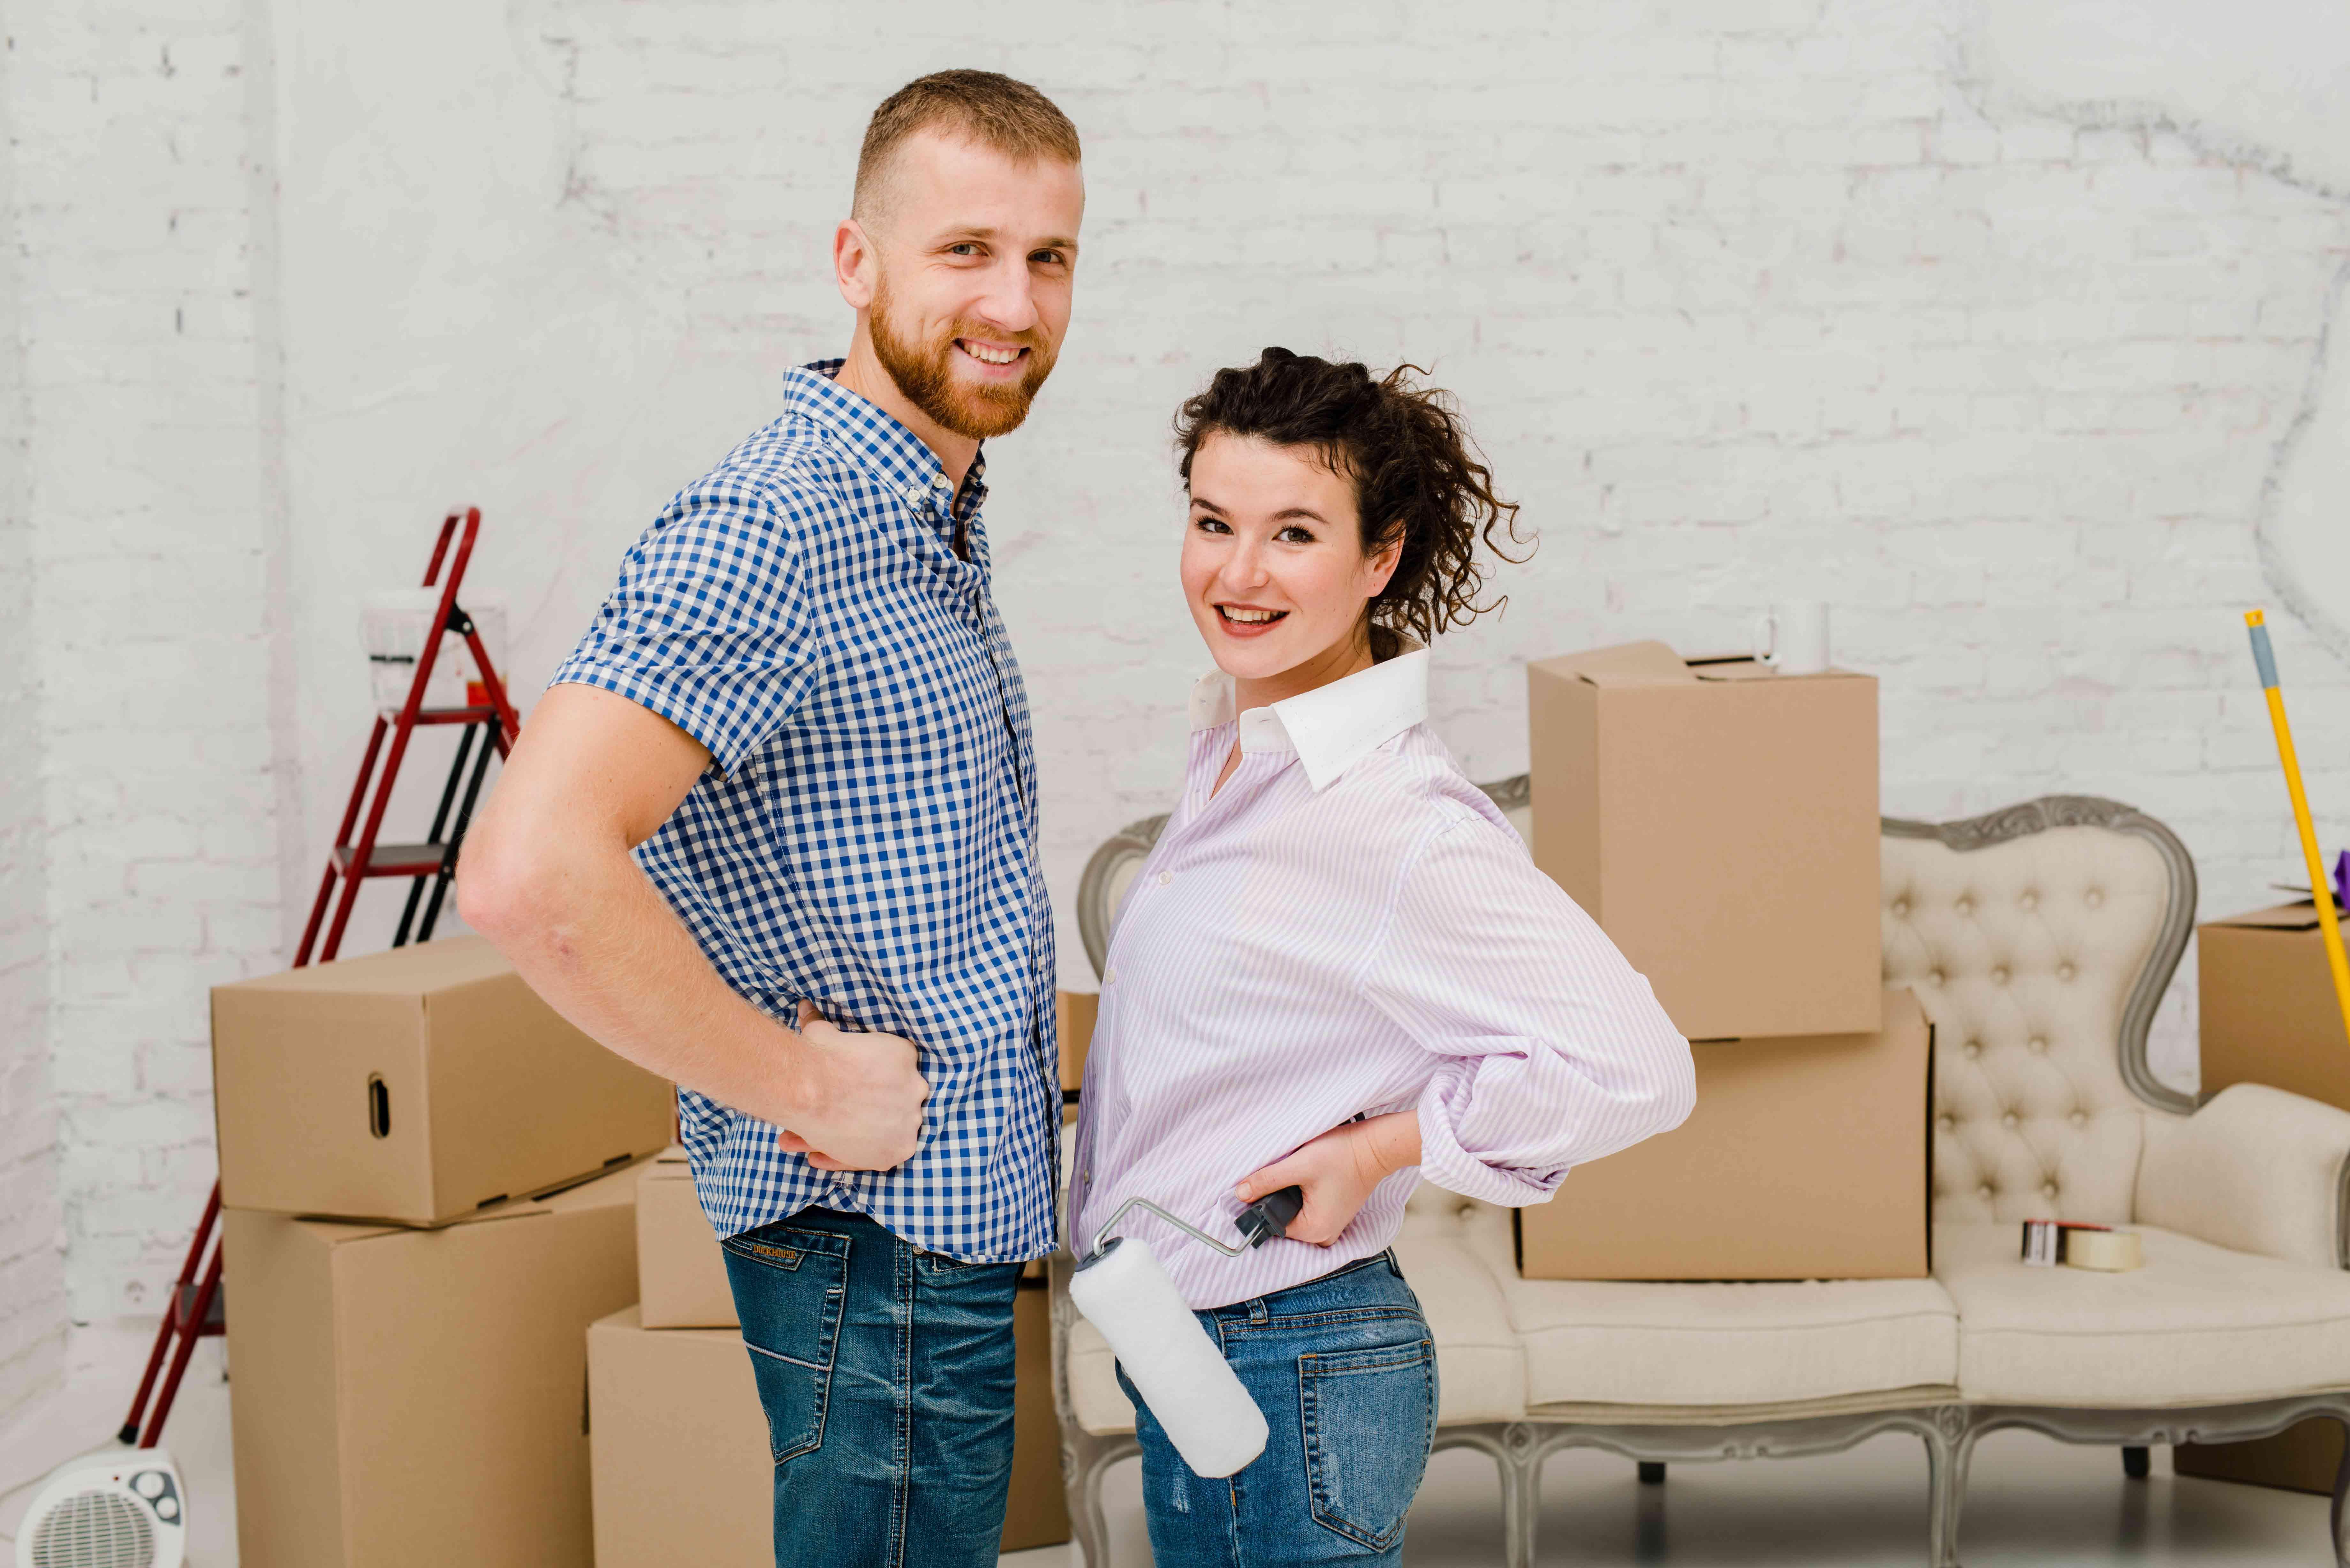 Stress-free home renovation tips